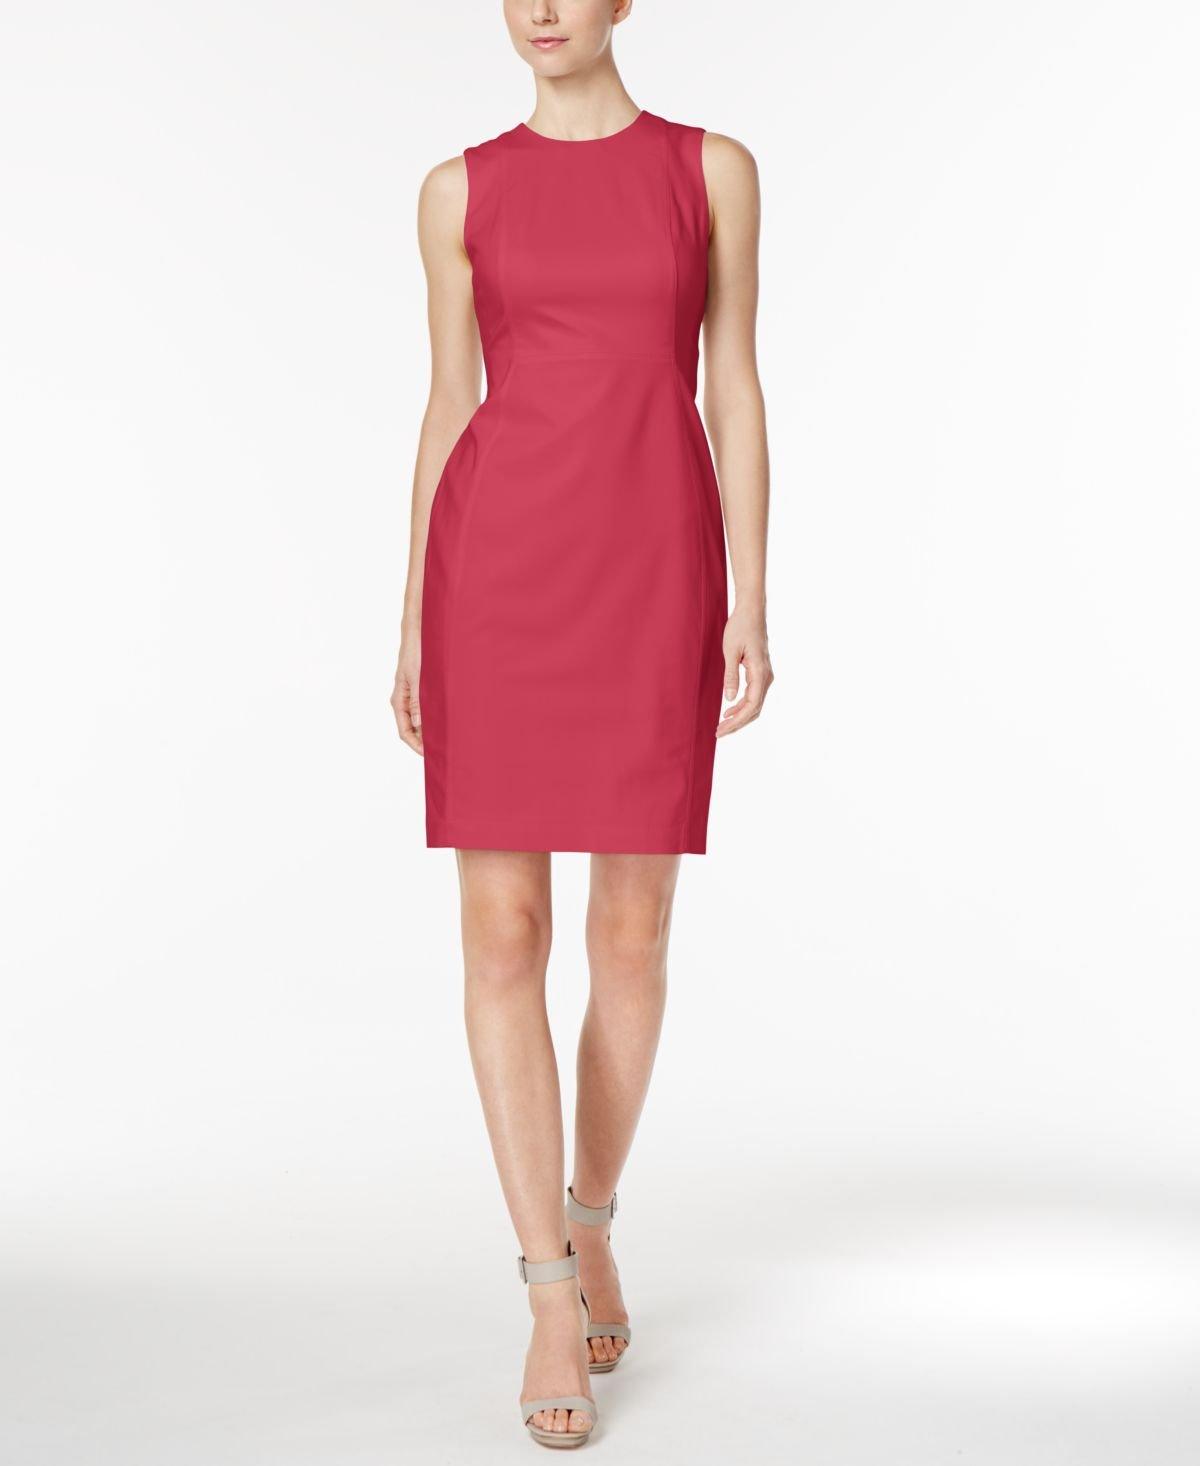 Calvin Klein Women's Cotton Princess Panel Sheath Dress Lipstick Dress